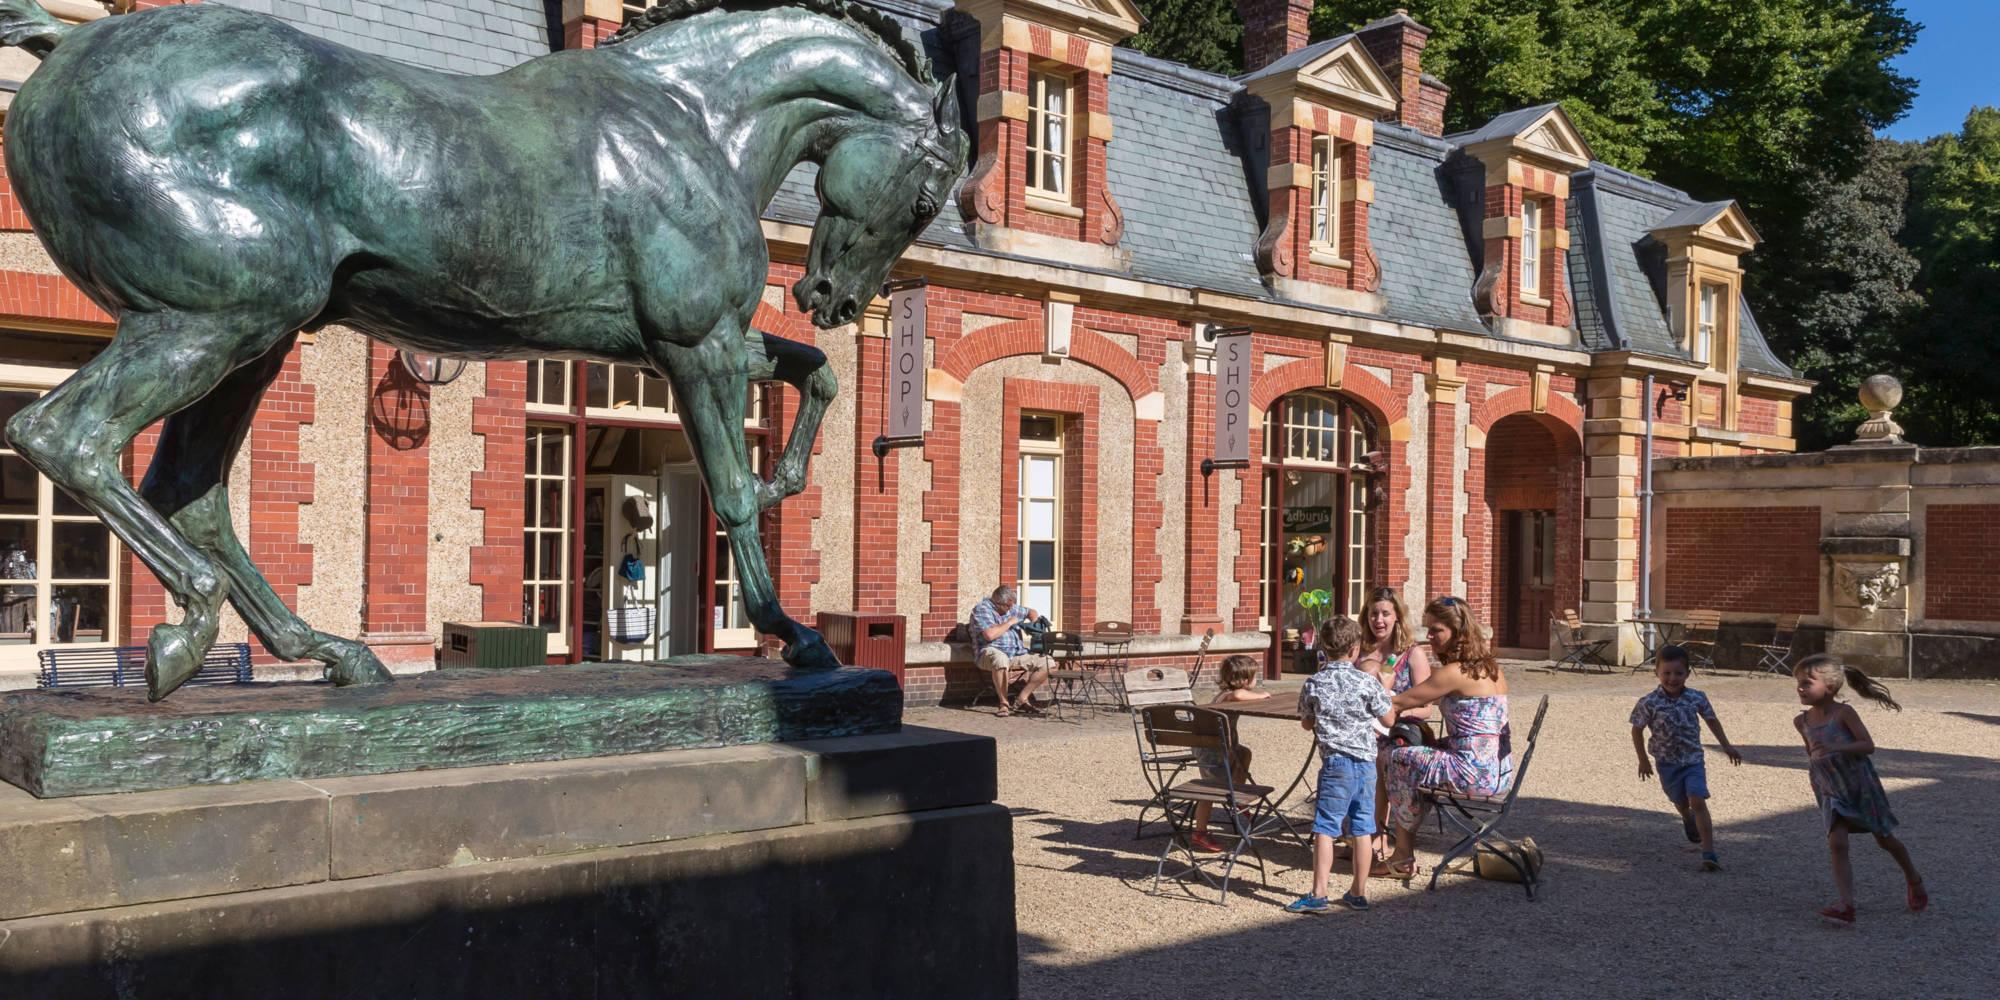 Stables courtyard with Copenhagen horse statue